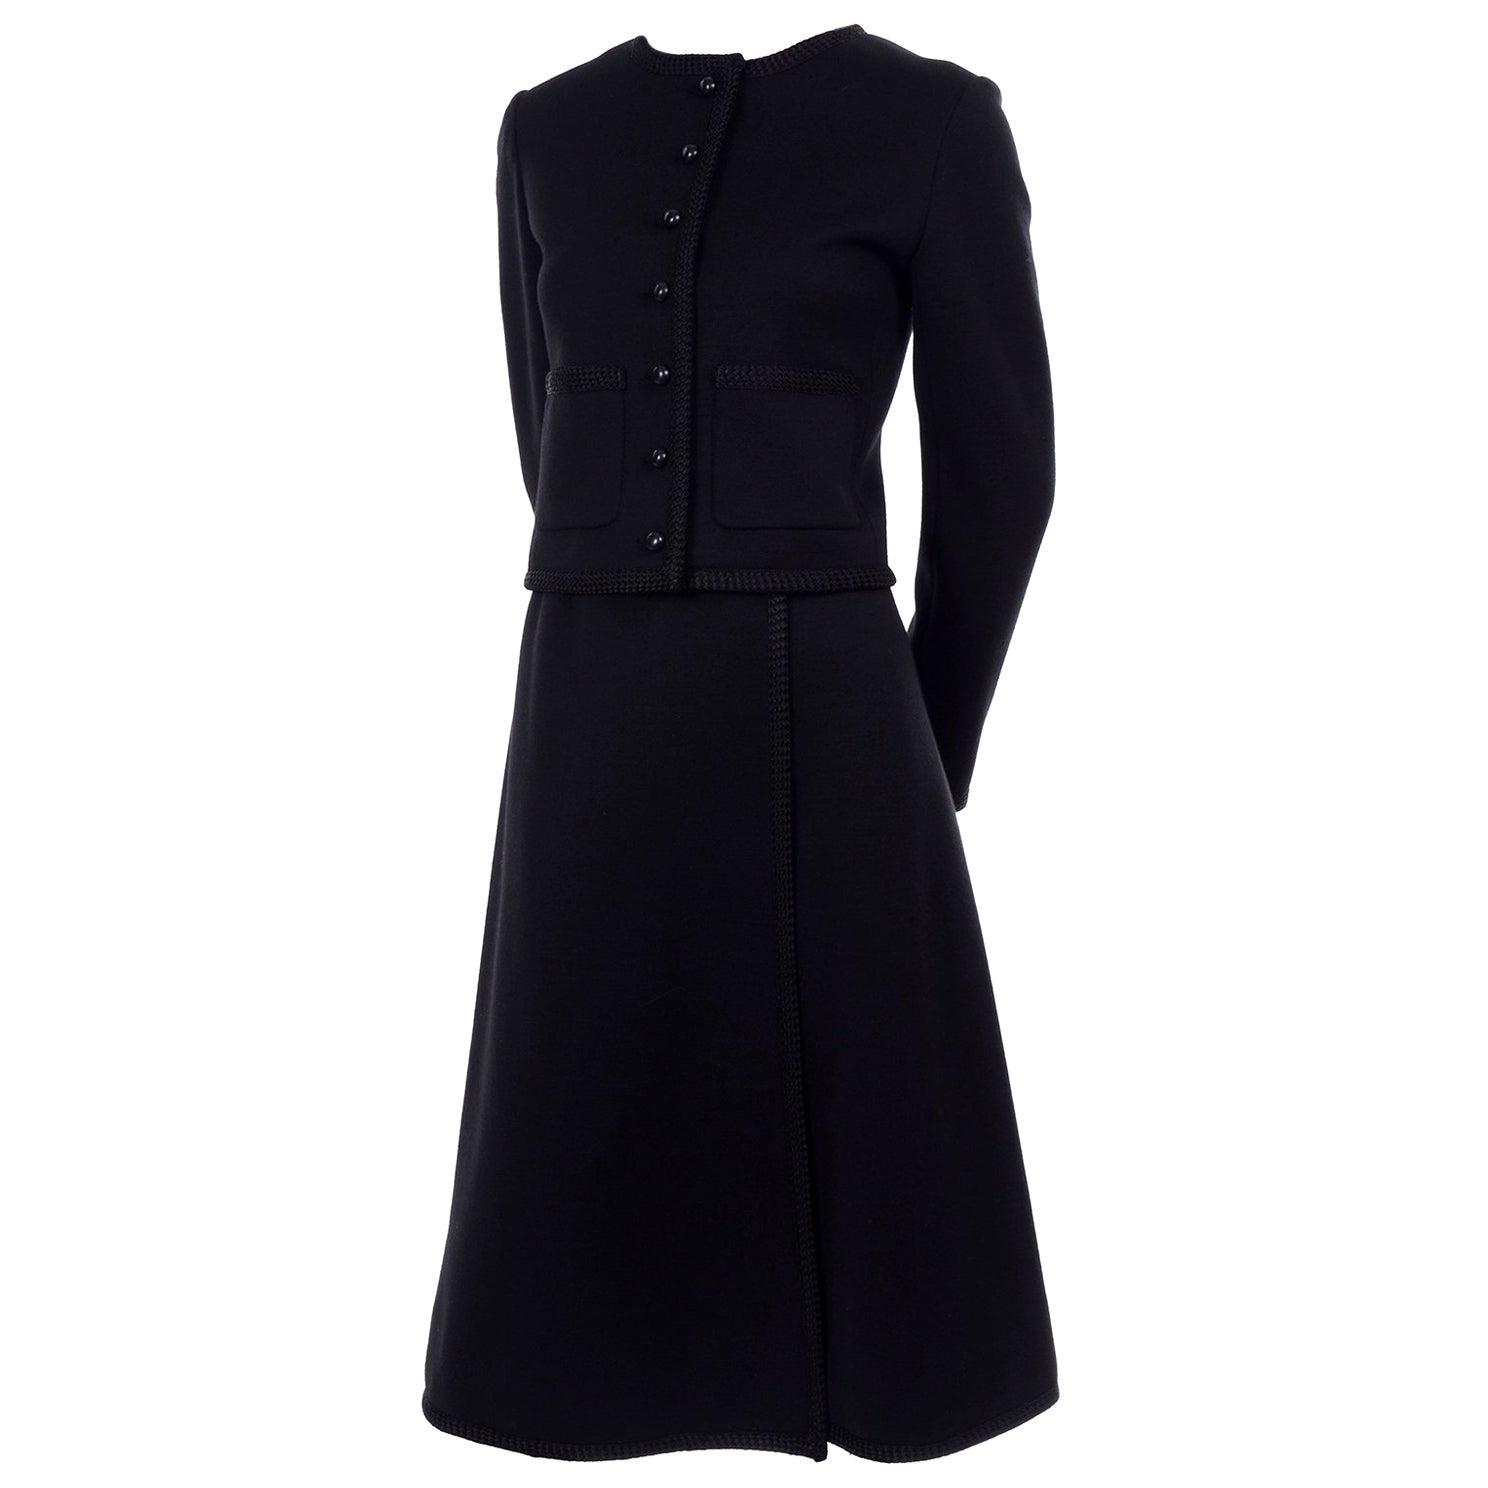 Vintage YSL Yves Saint Laurent Black Wool Skirt Suit w/ Boxy Jacket & Braid Trim